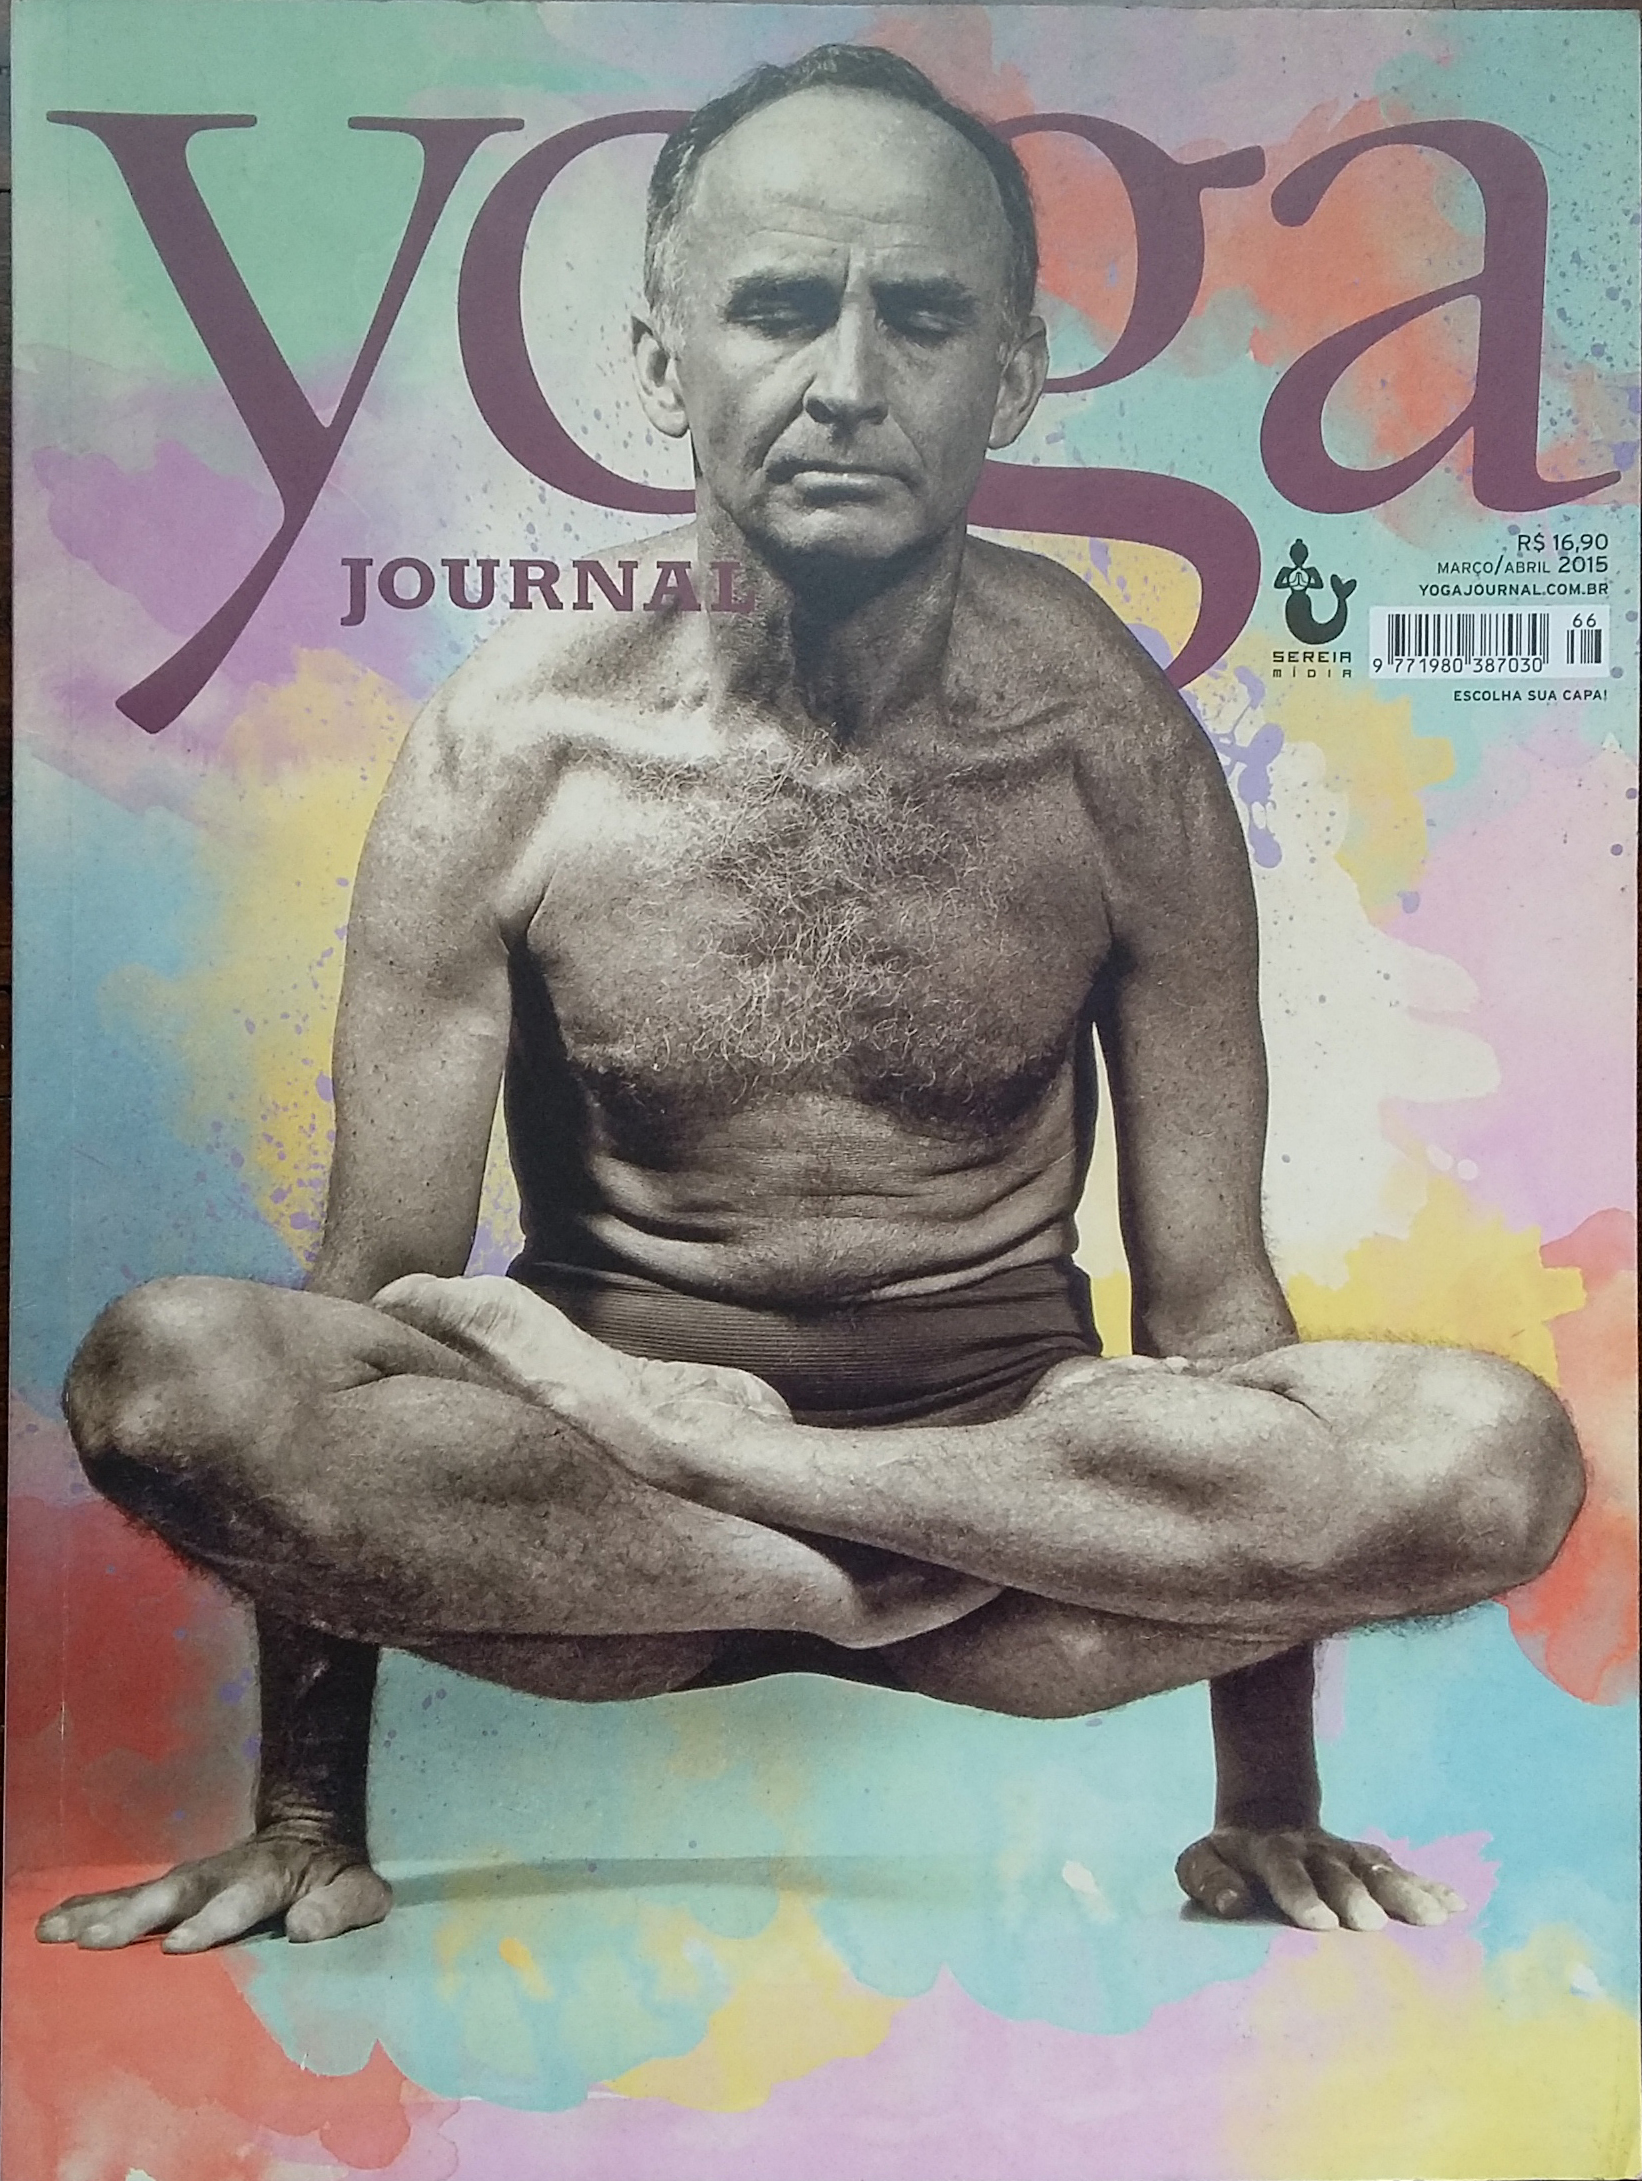 YogaJournal-Hermogenes-capa.jpg